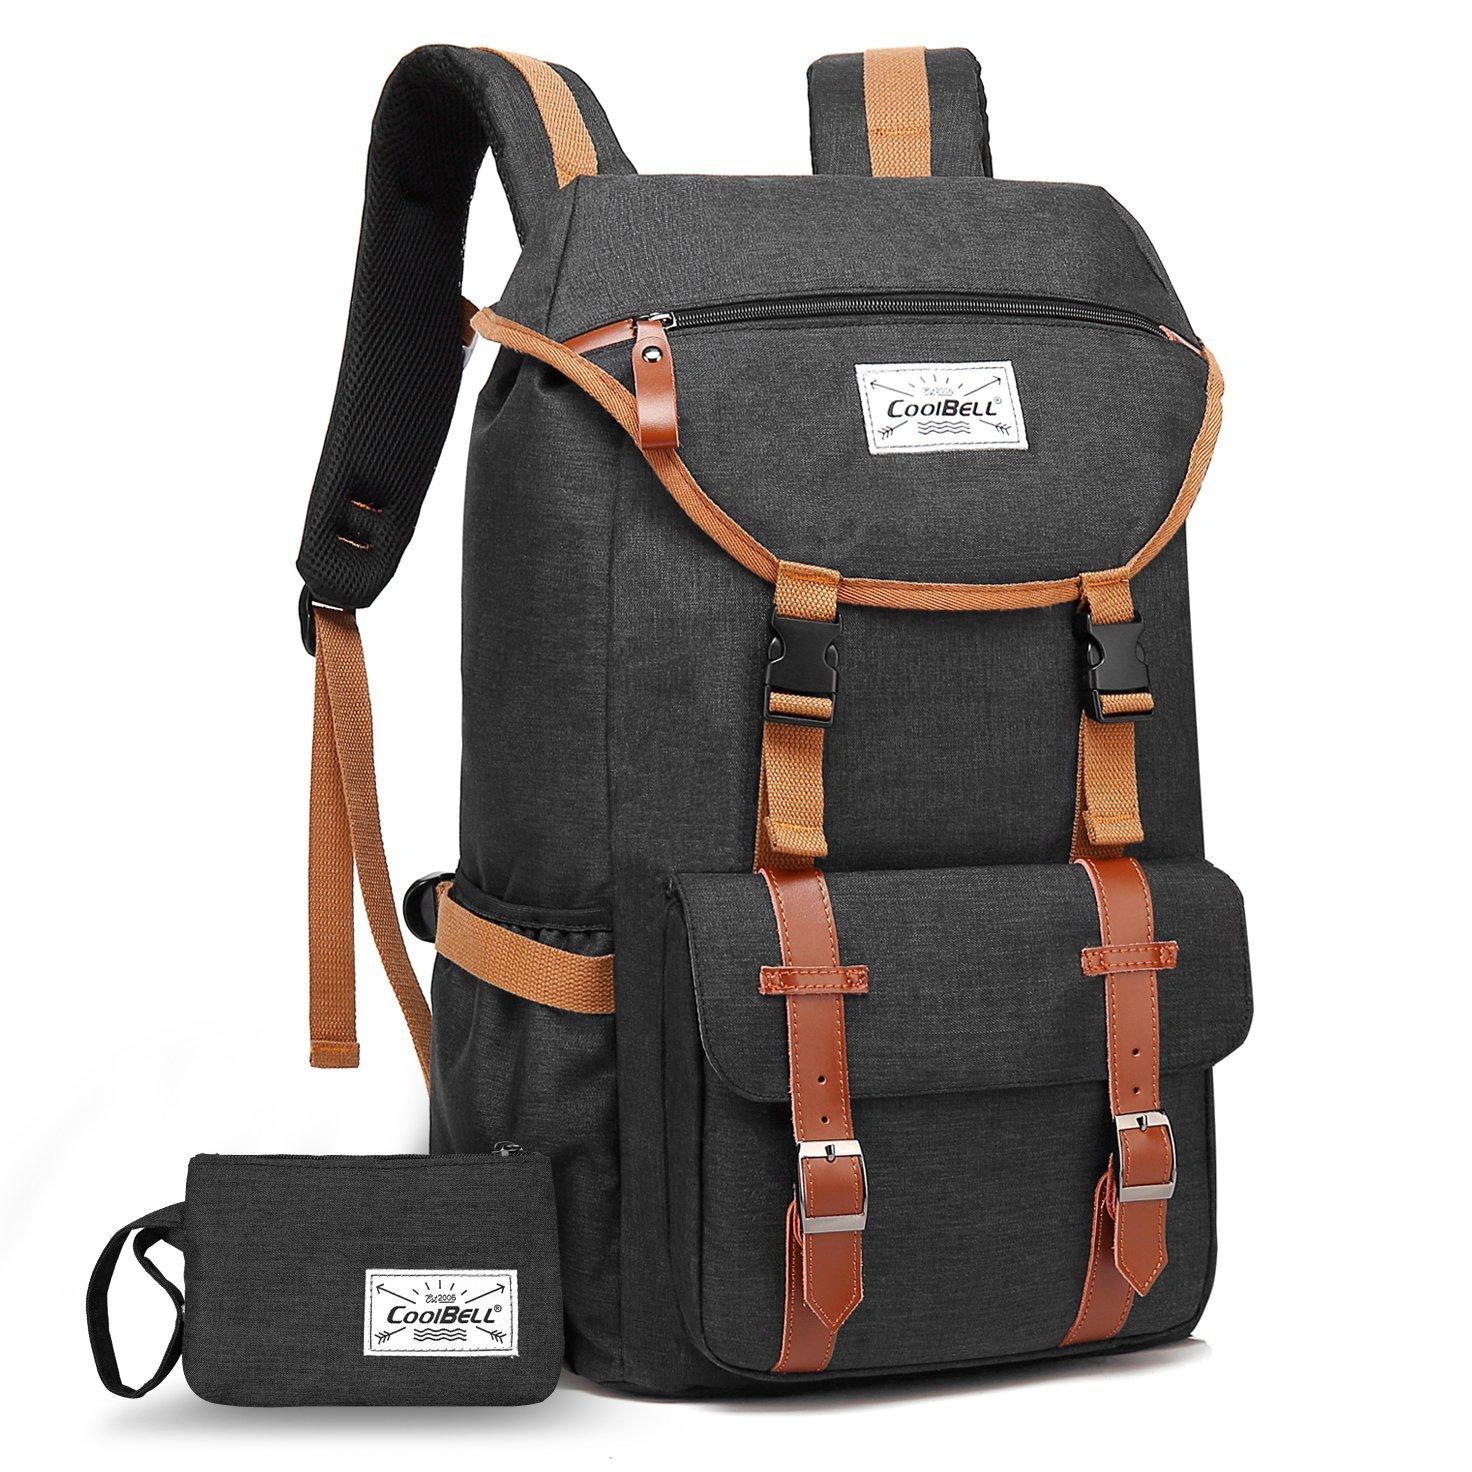 Travel Backpack Amzbag 17.3 inches Laptop Backpack Leisure Outdoor Rucksack Hiking Knapsack School Daypack Multi-Functional Business Bag for/Men/Women/College (38L, Grey)